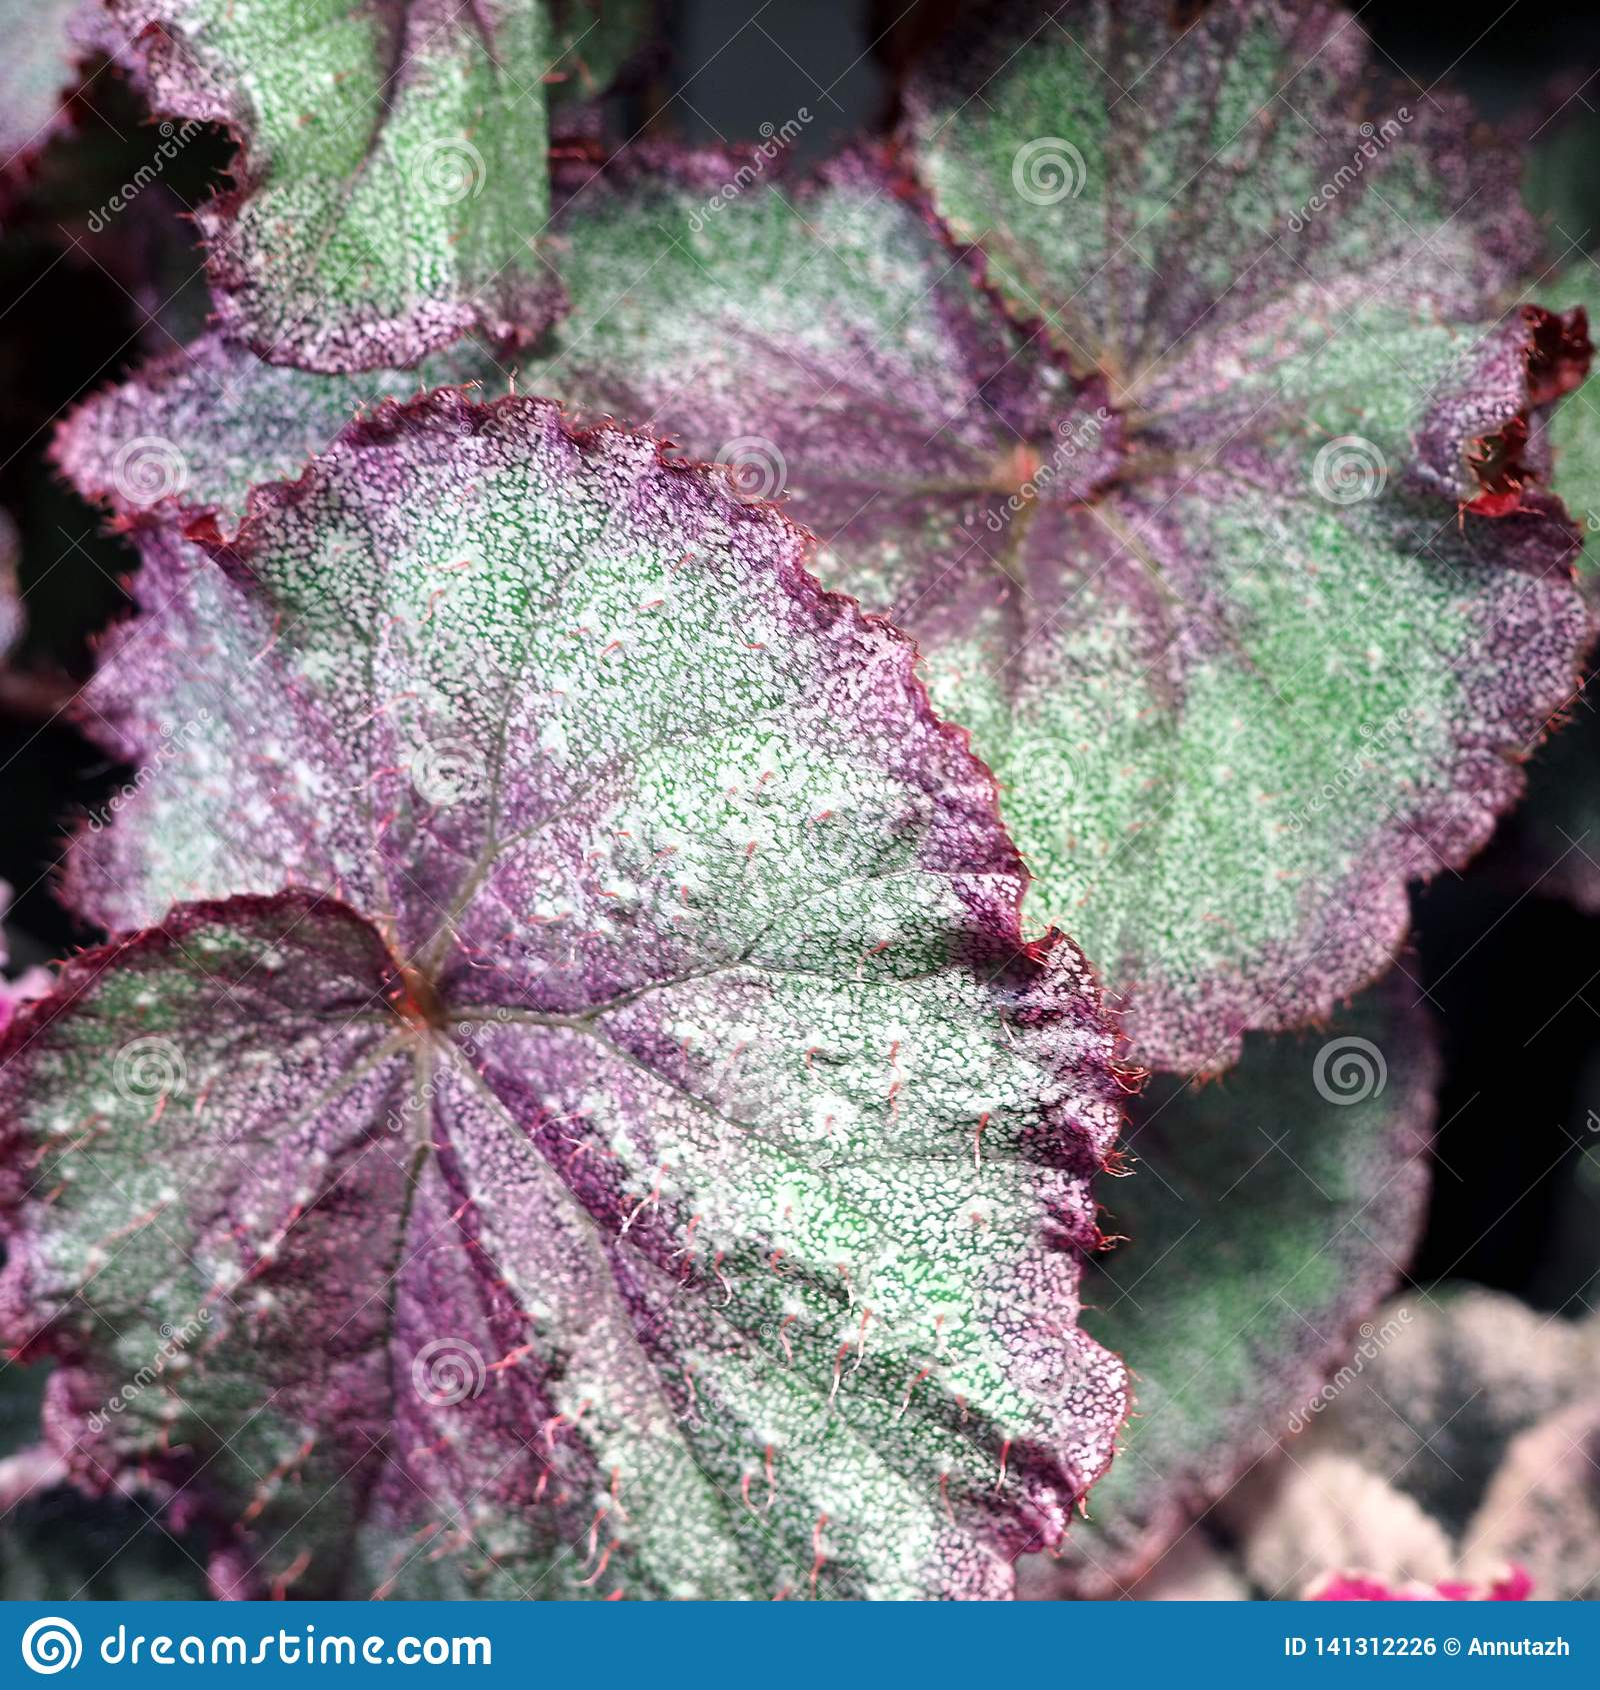 Decorative Leaves Of Houseplants Stock Photo - Image of ... on